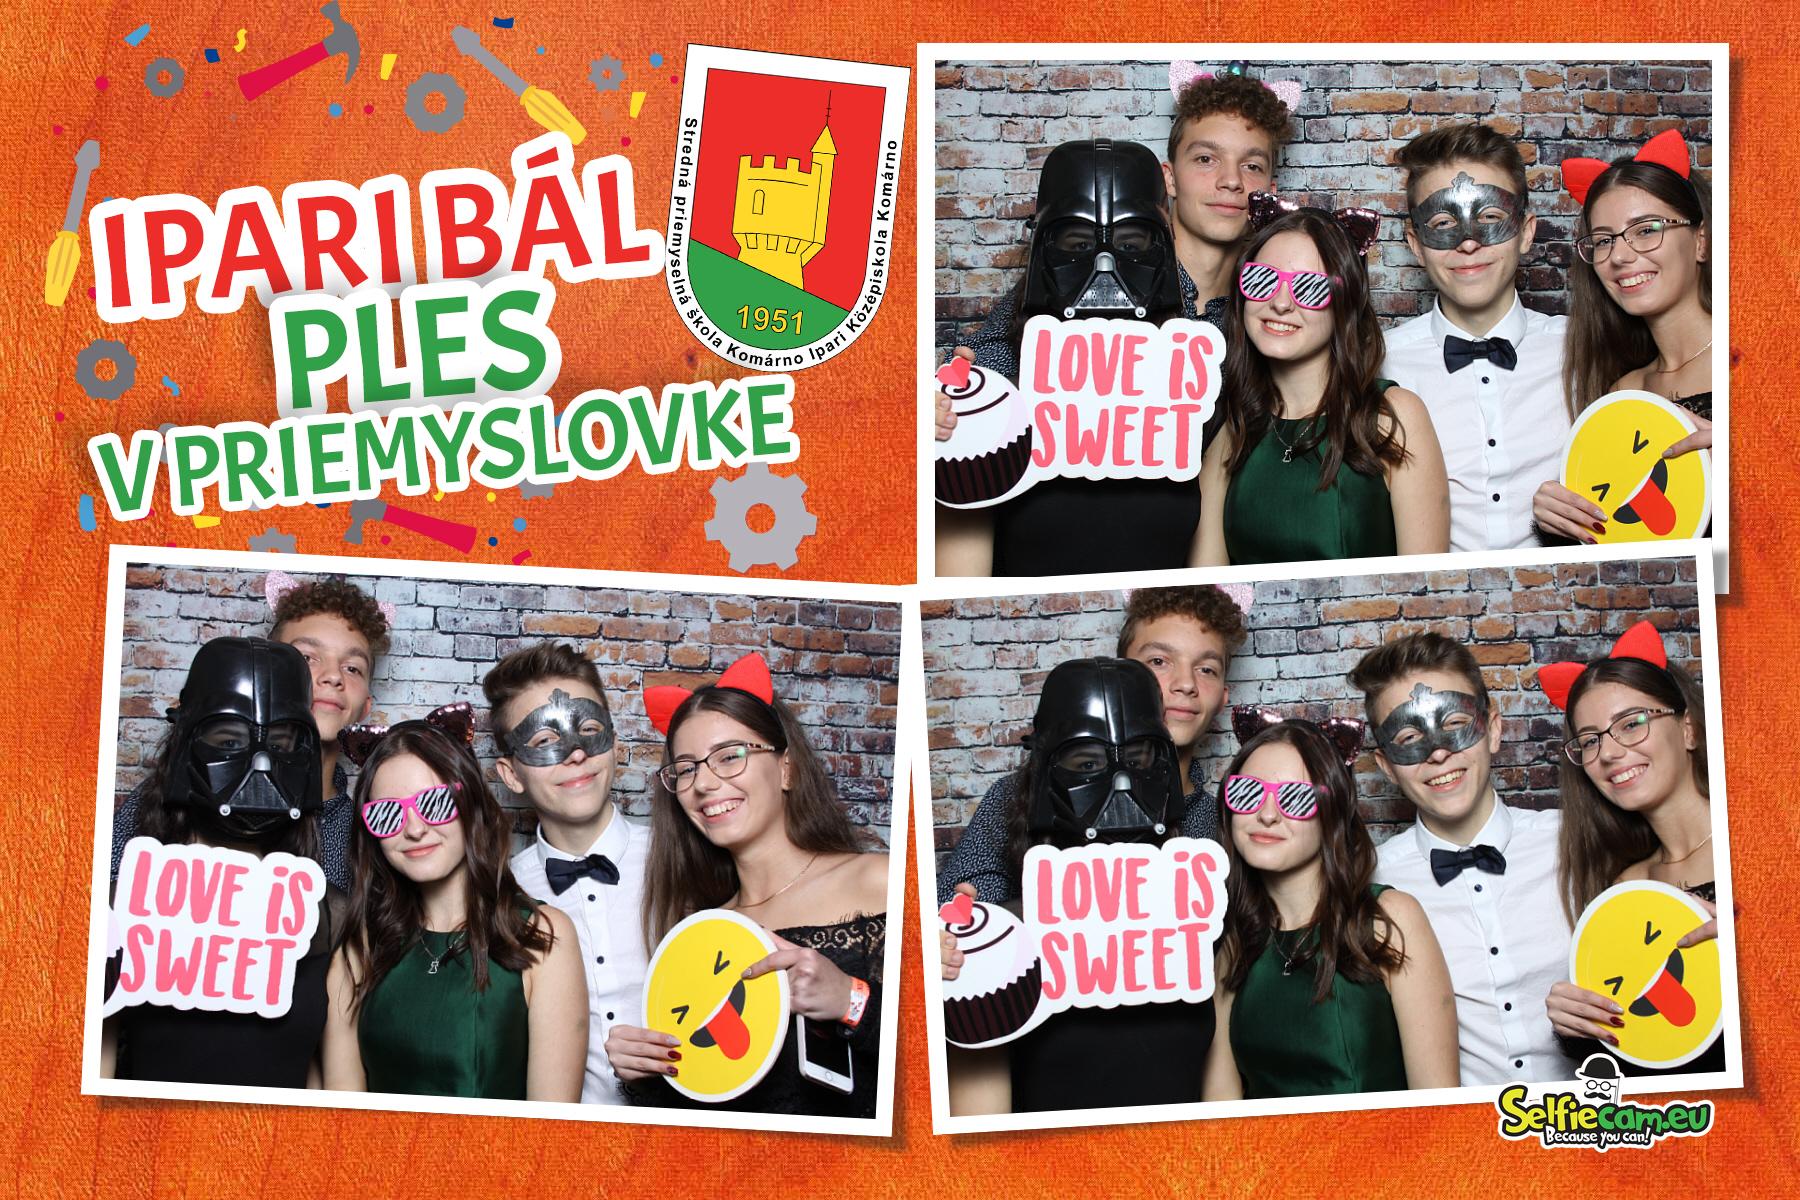 selfiecam-2019-11-07-Ipari-bal-Ples-v-Priemyslovke (17)